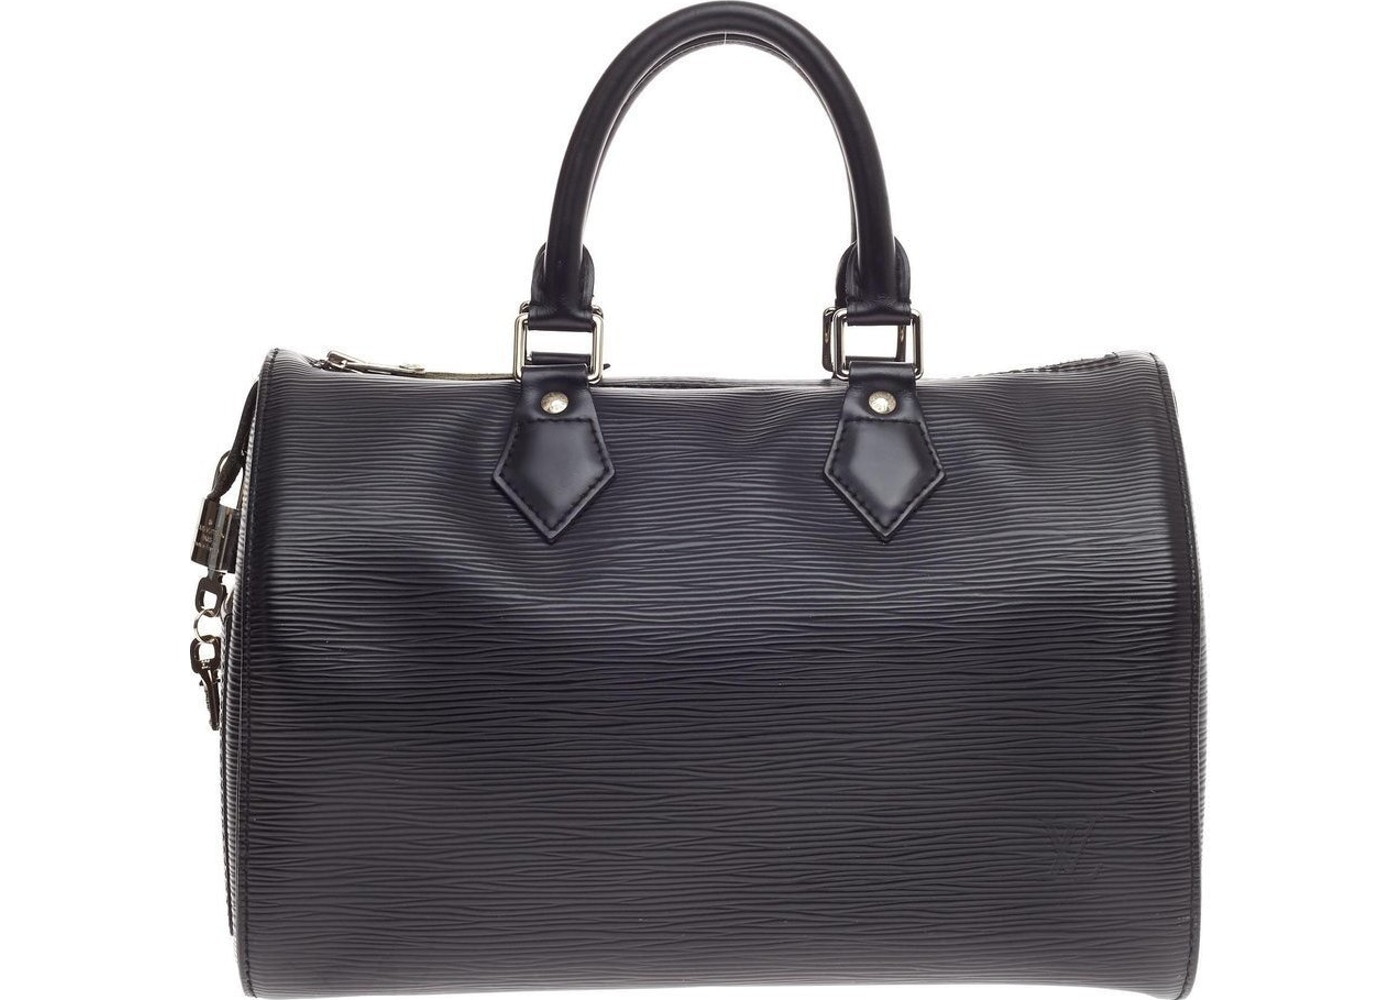 056b6fe72e90 Louis Vuitton Speedy Epi 25 Black